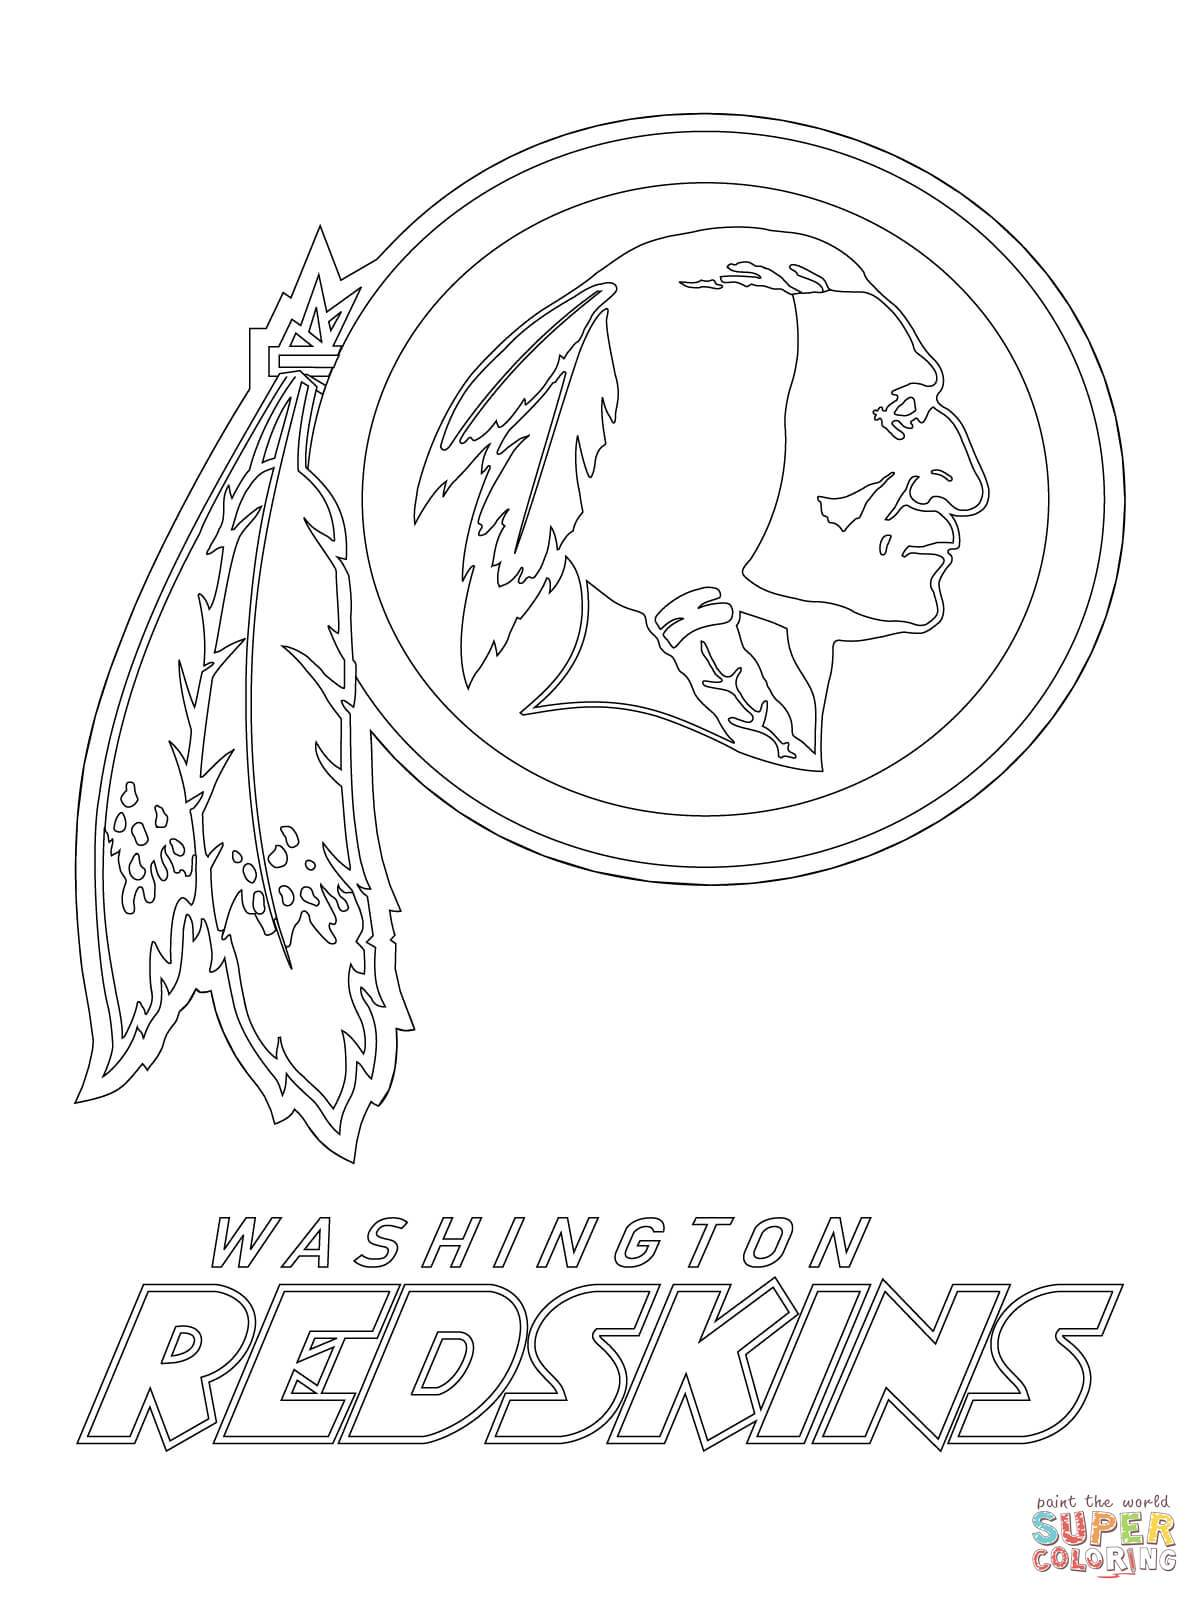 Seattle Seahawks Logo Drawing At Getdrawings